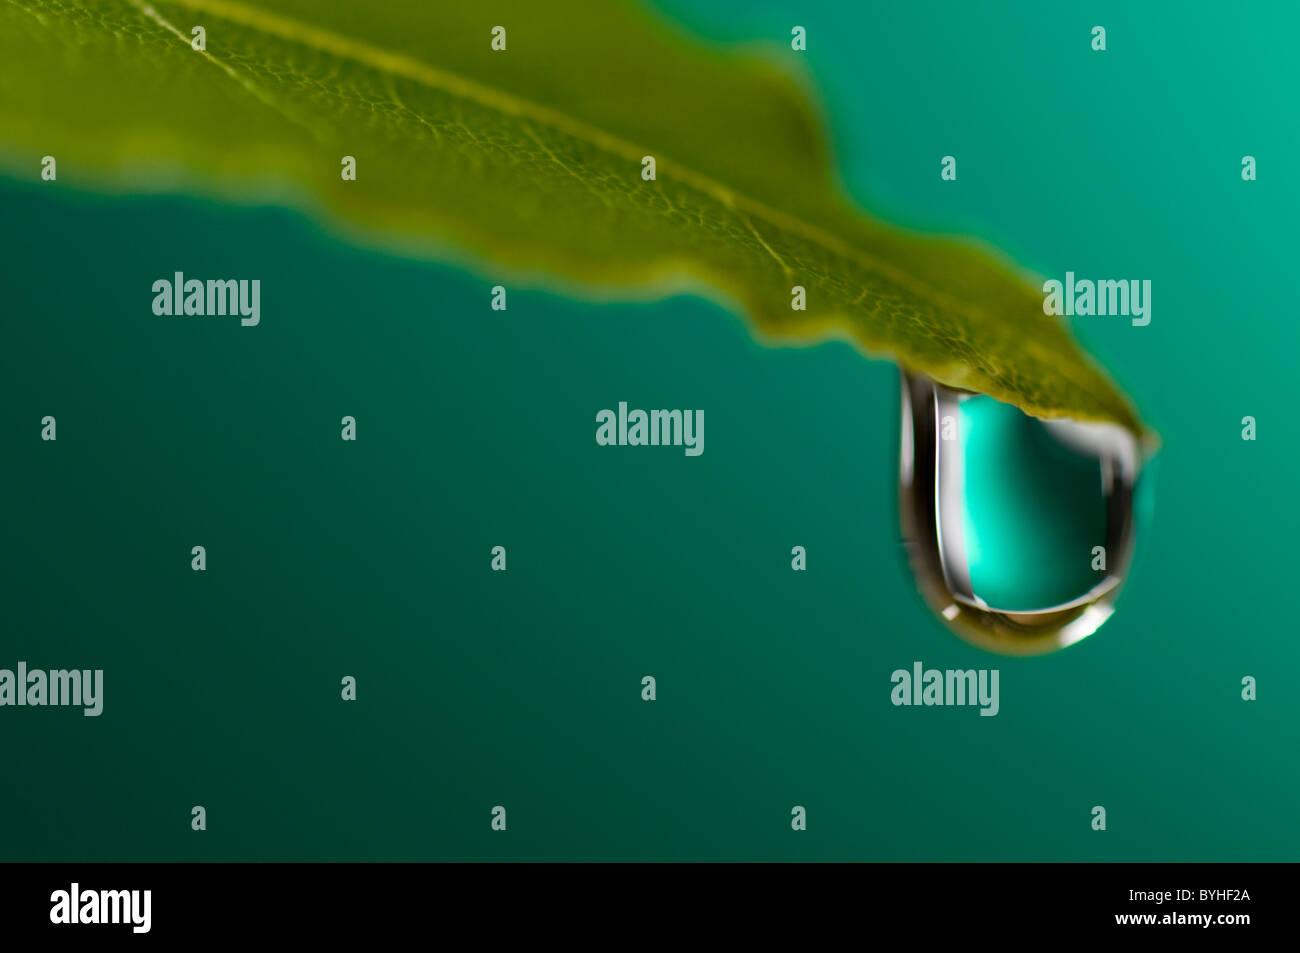 Gota de agua en la hoja Imagen De Stock